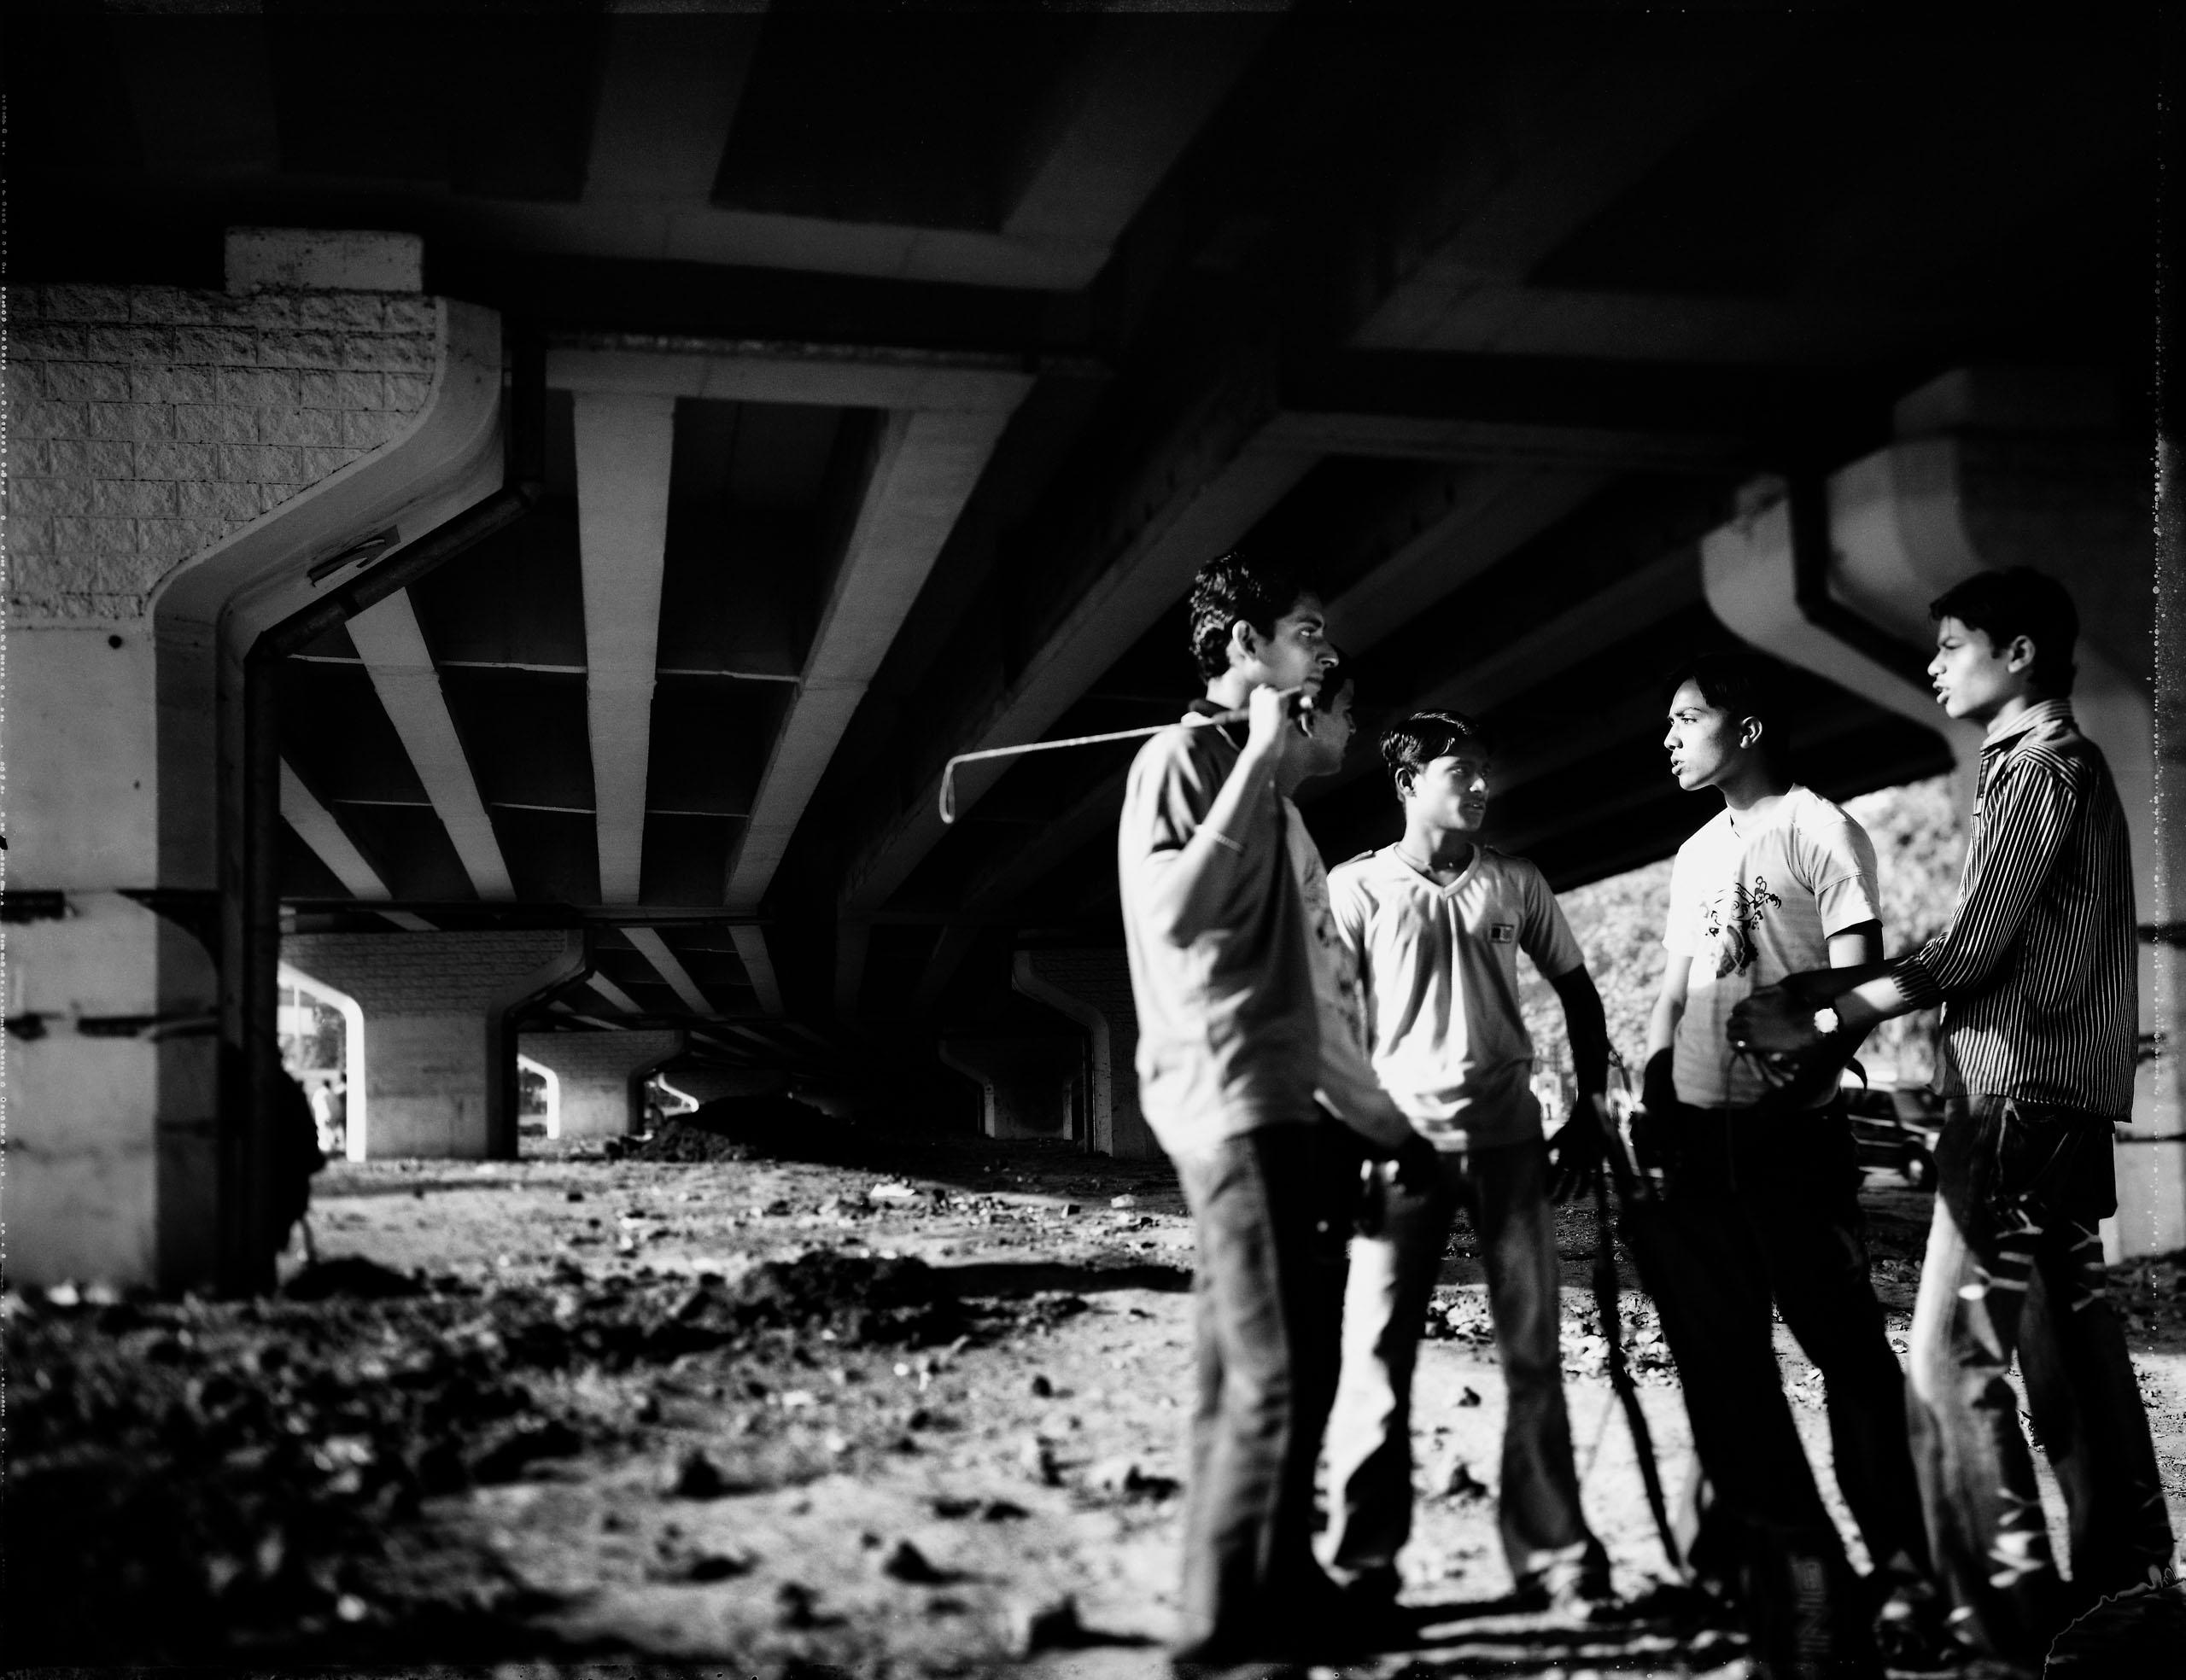 (From left) Harish, Laxman, Sanjay and Raja discuss course management. Photo by Tomasz Gudzowaty.